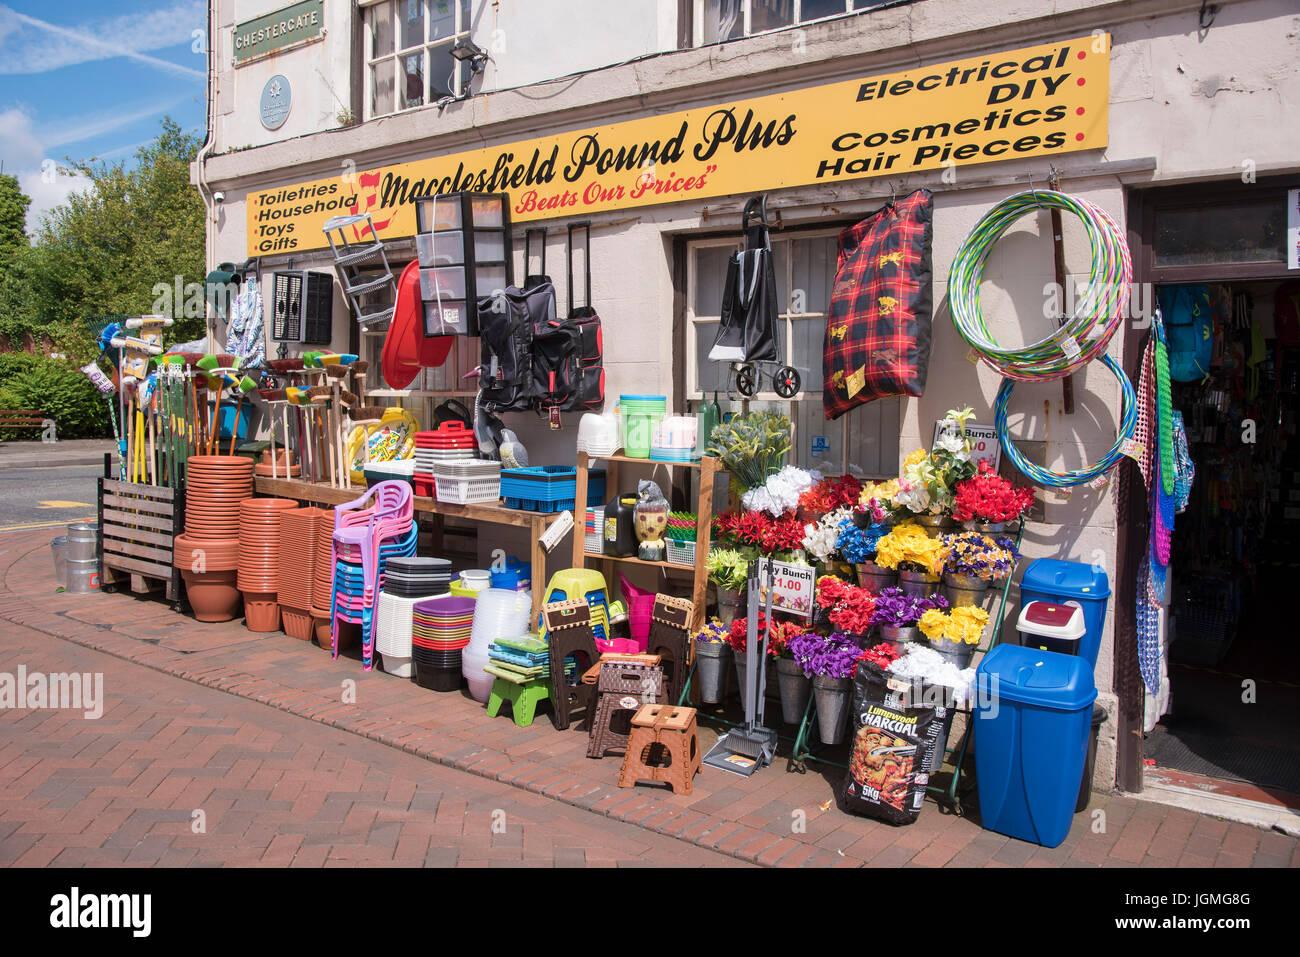 Junk shop in Macclesfield Stock Photo: 147969264 - Alamy